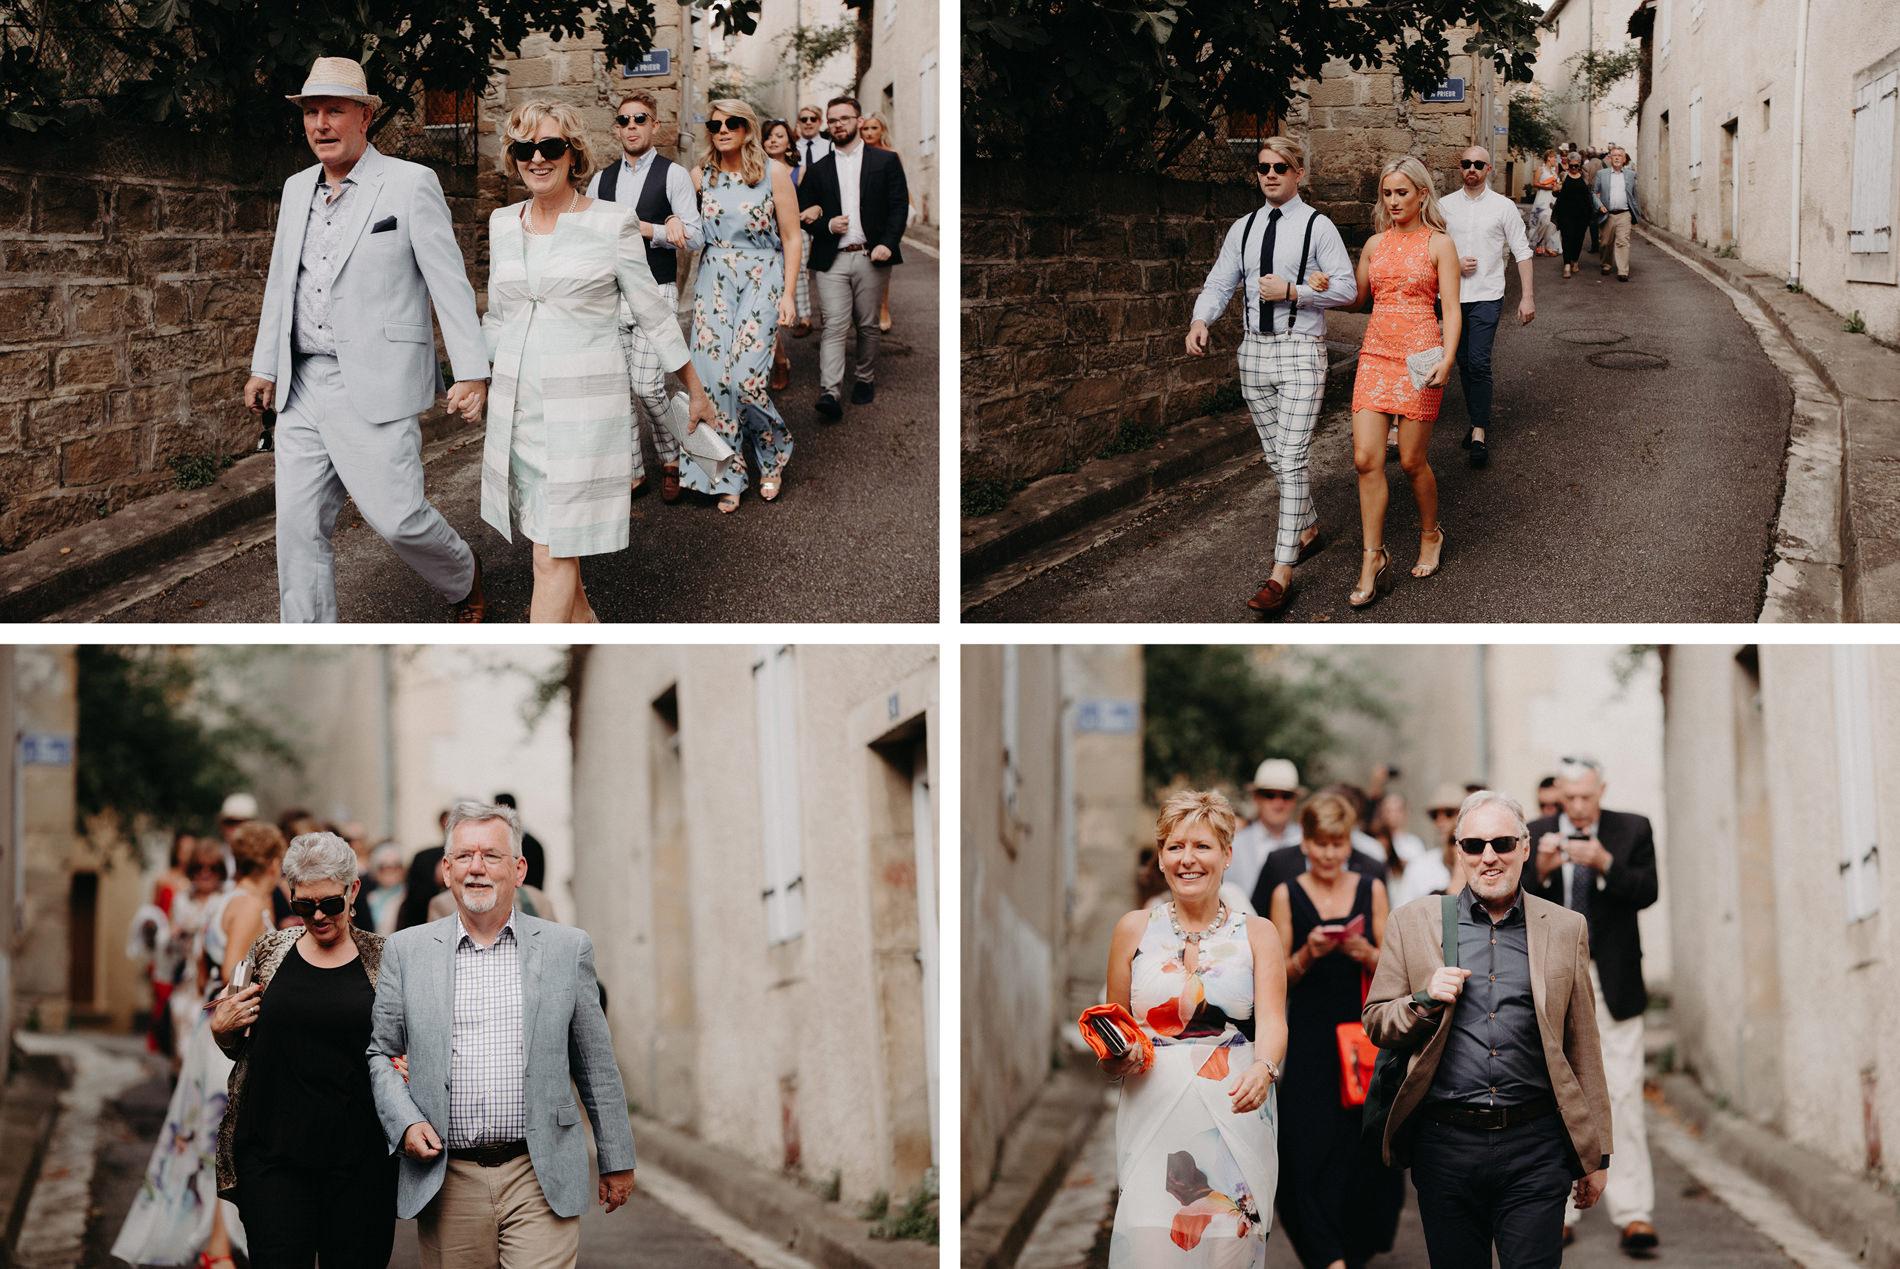 Labbaye chateau de camon wedding